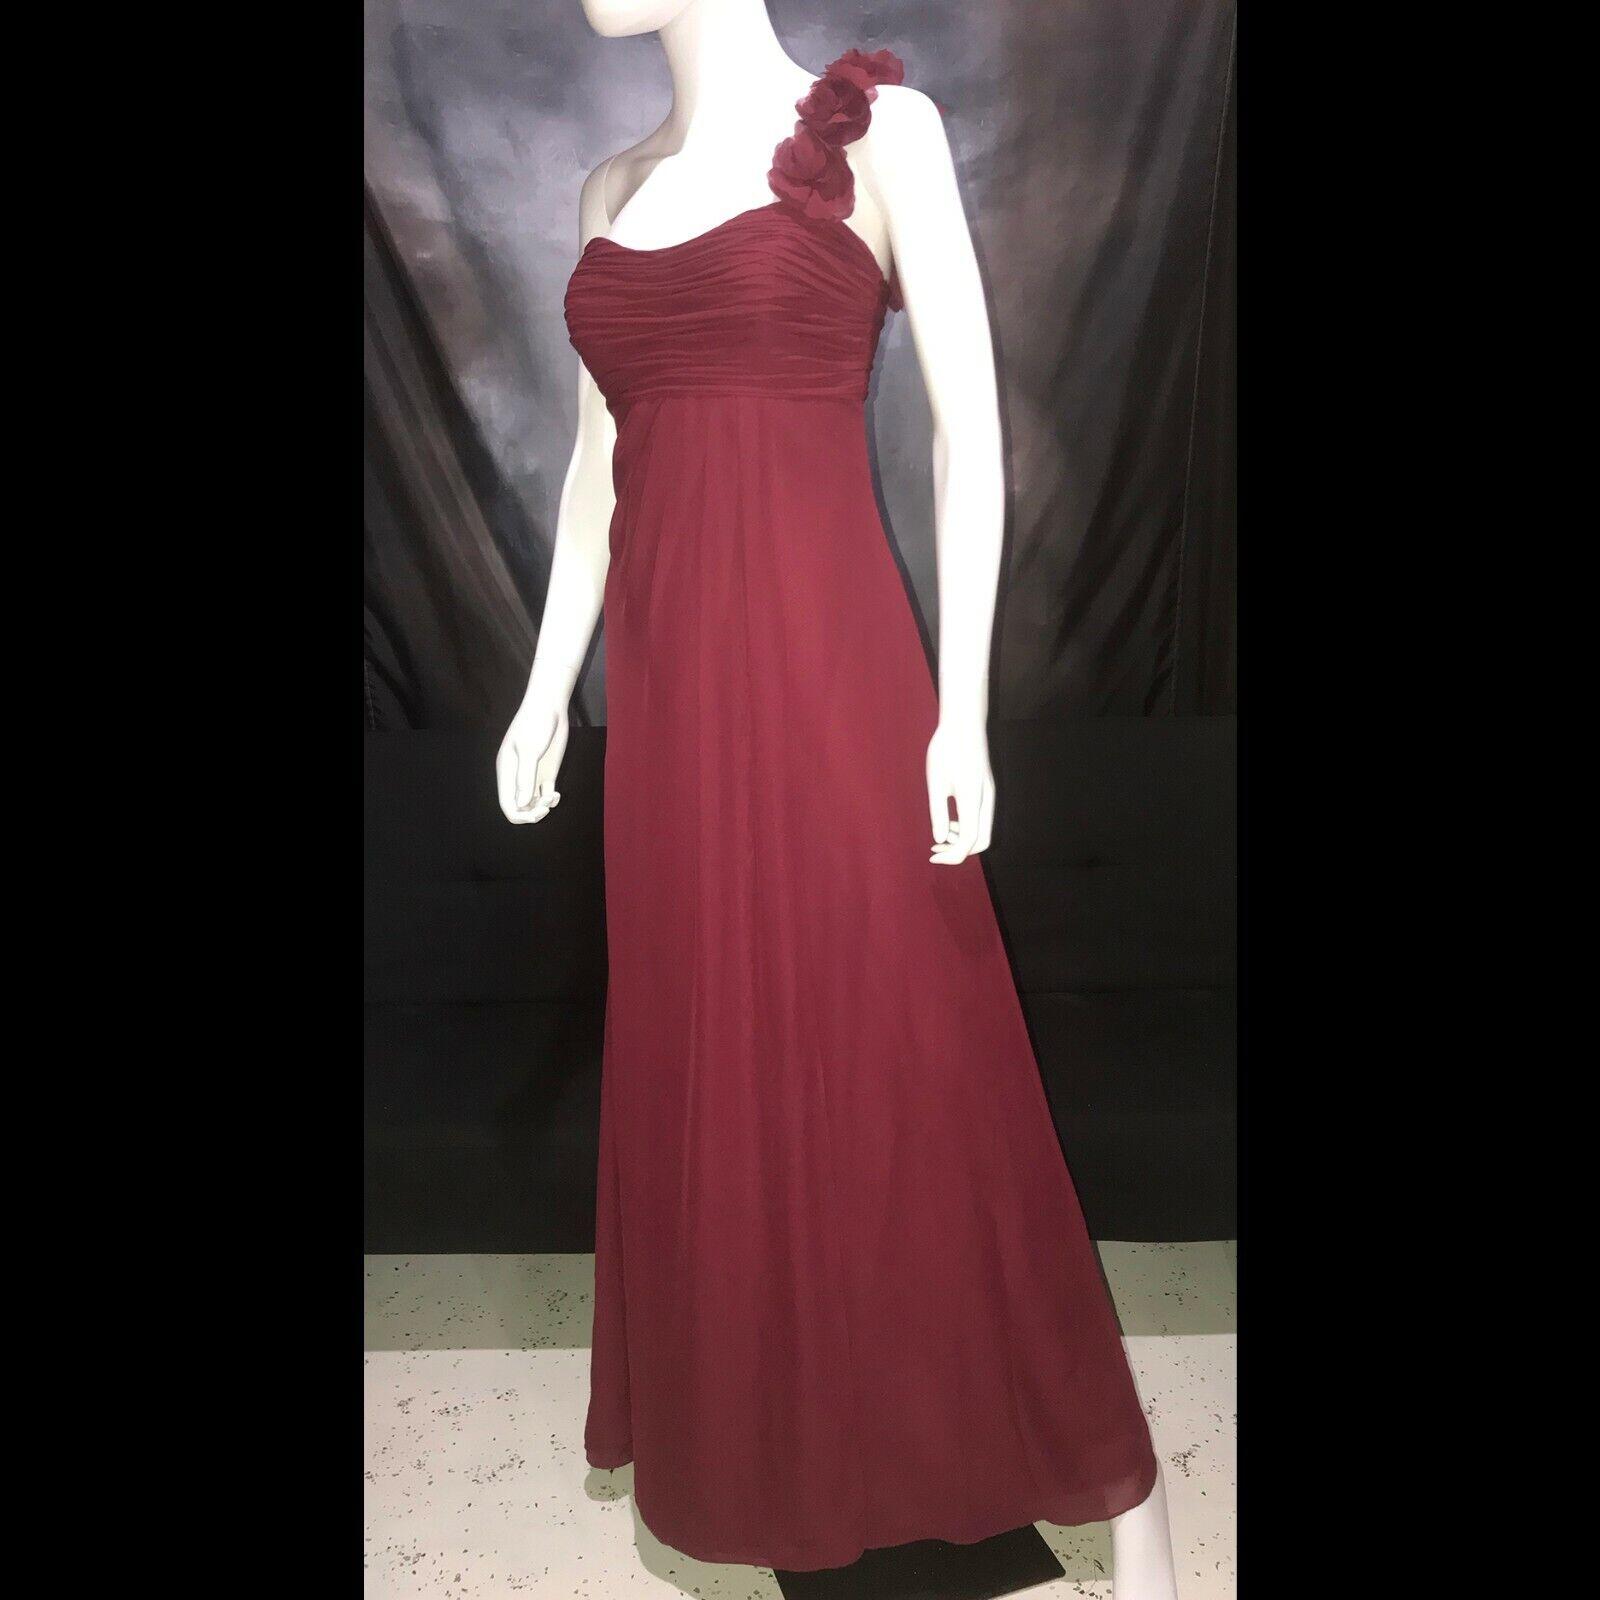 Vtg Jordan Maroon Chiffon One Shoulder Formal Gown Prom Dress Size 4